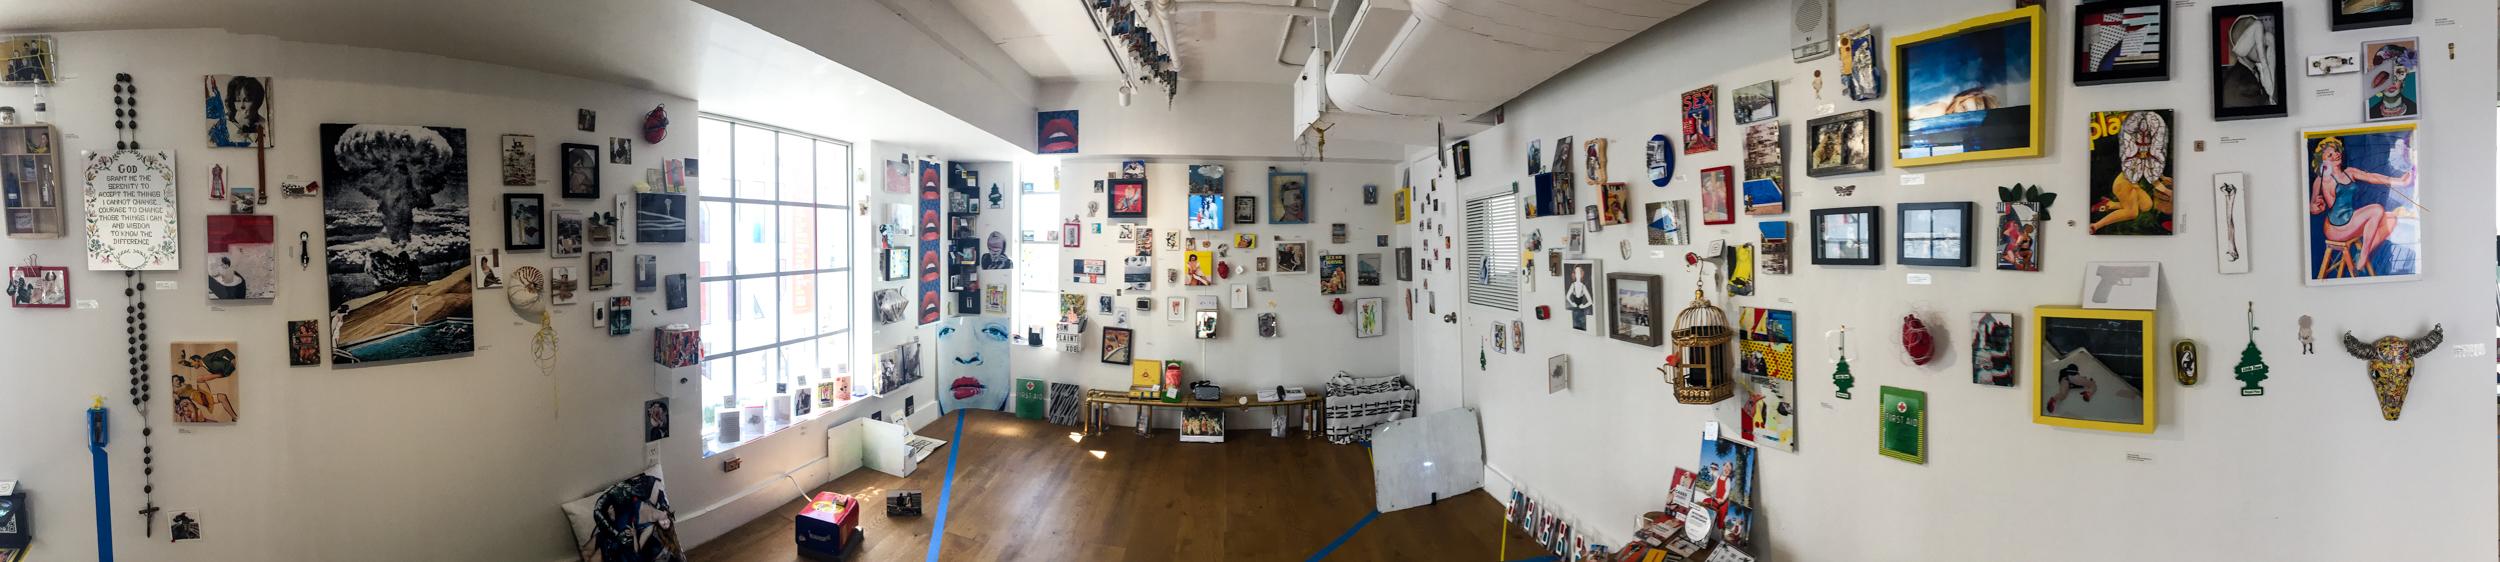 Faena-Exhibition-Images-142.jpg